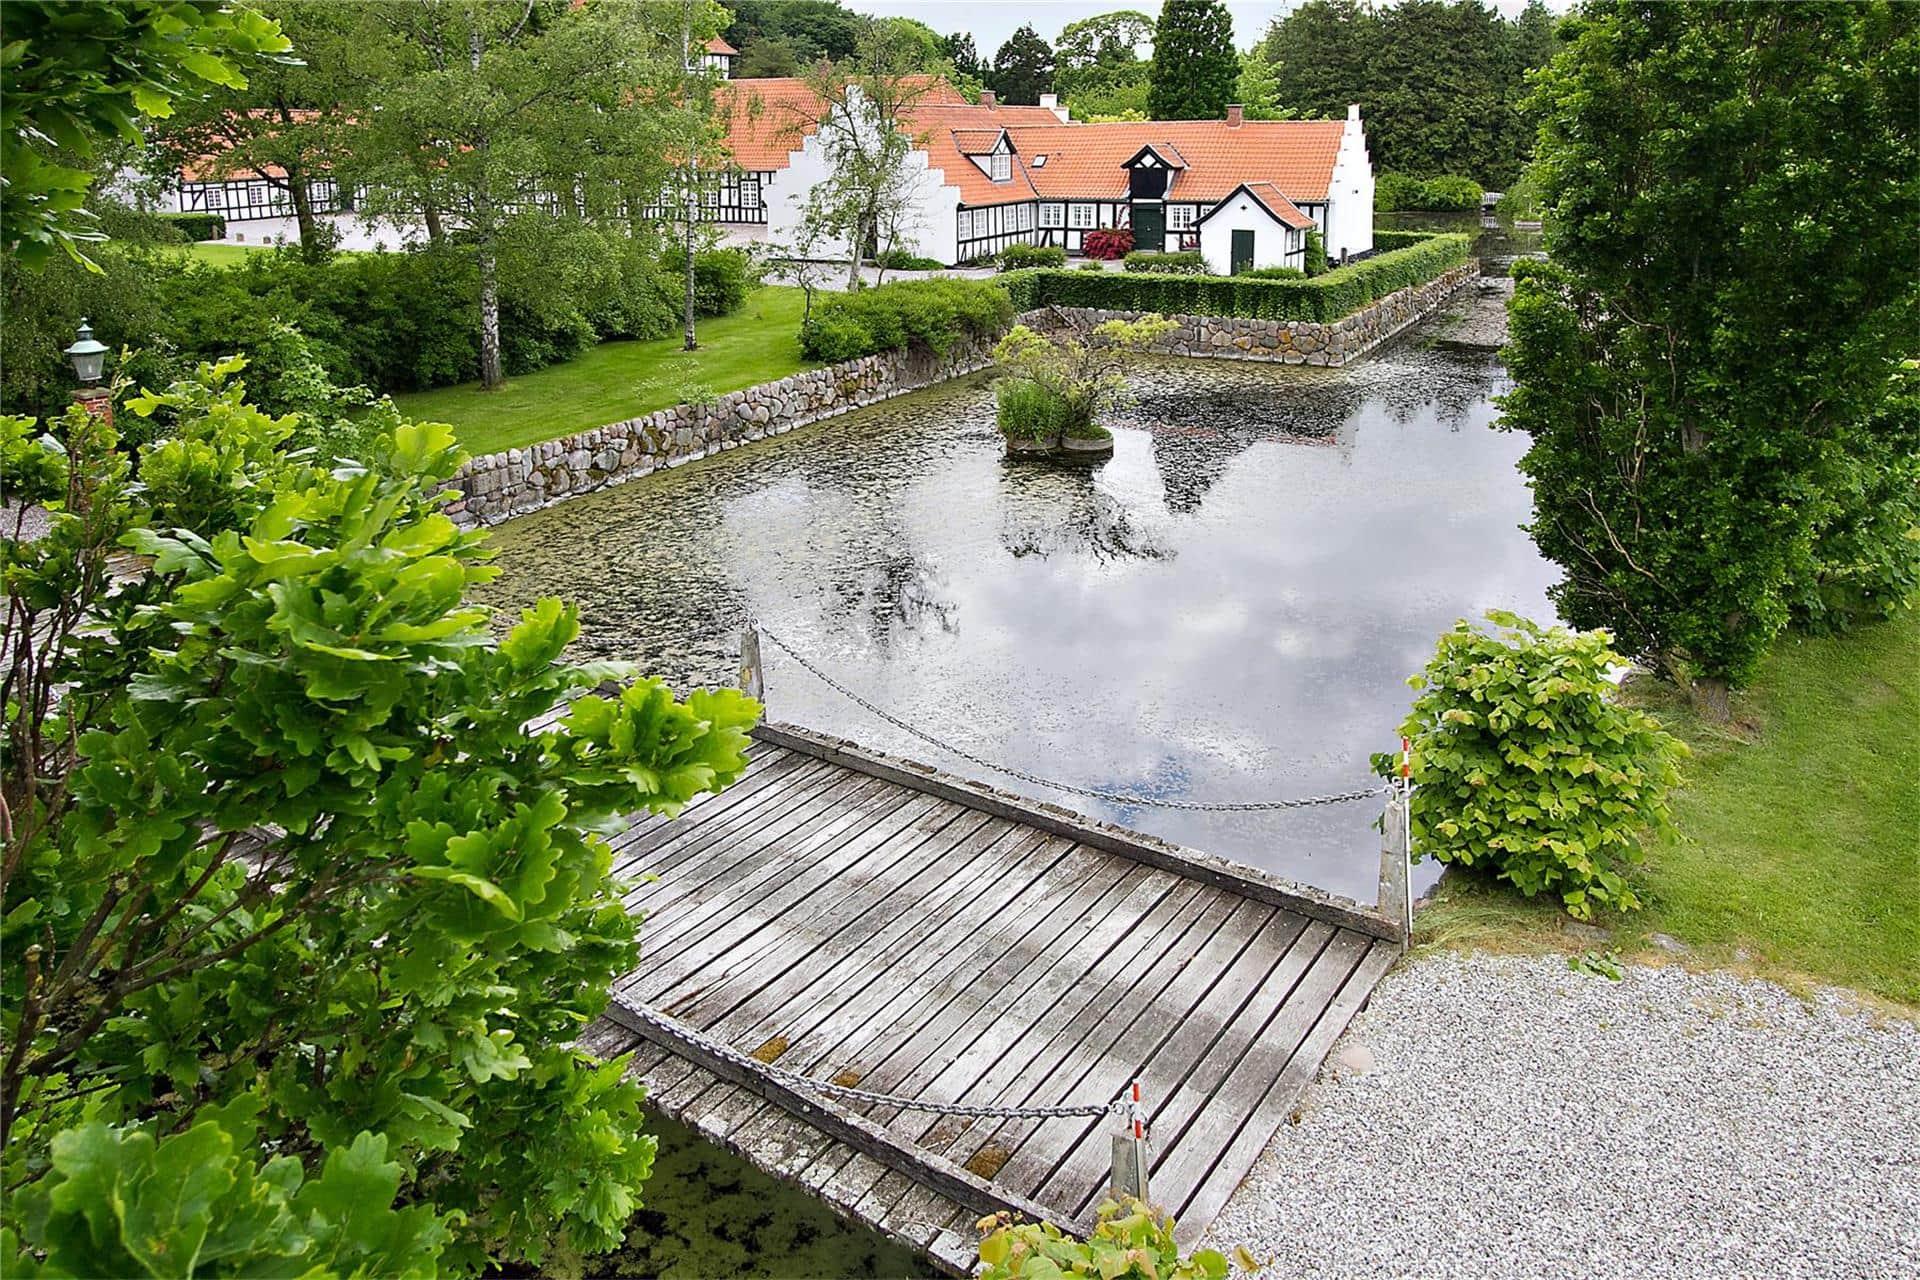 Bild 1-3 Ferienhaus M667191, Risingevej 7, DK - 5540 Ullerslev